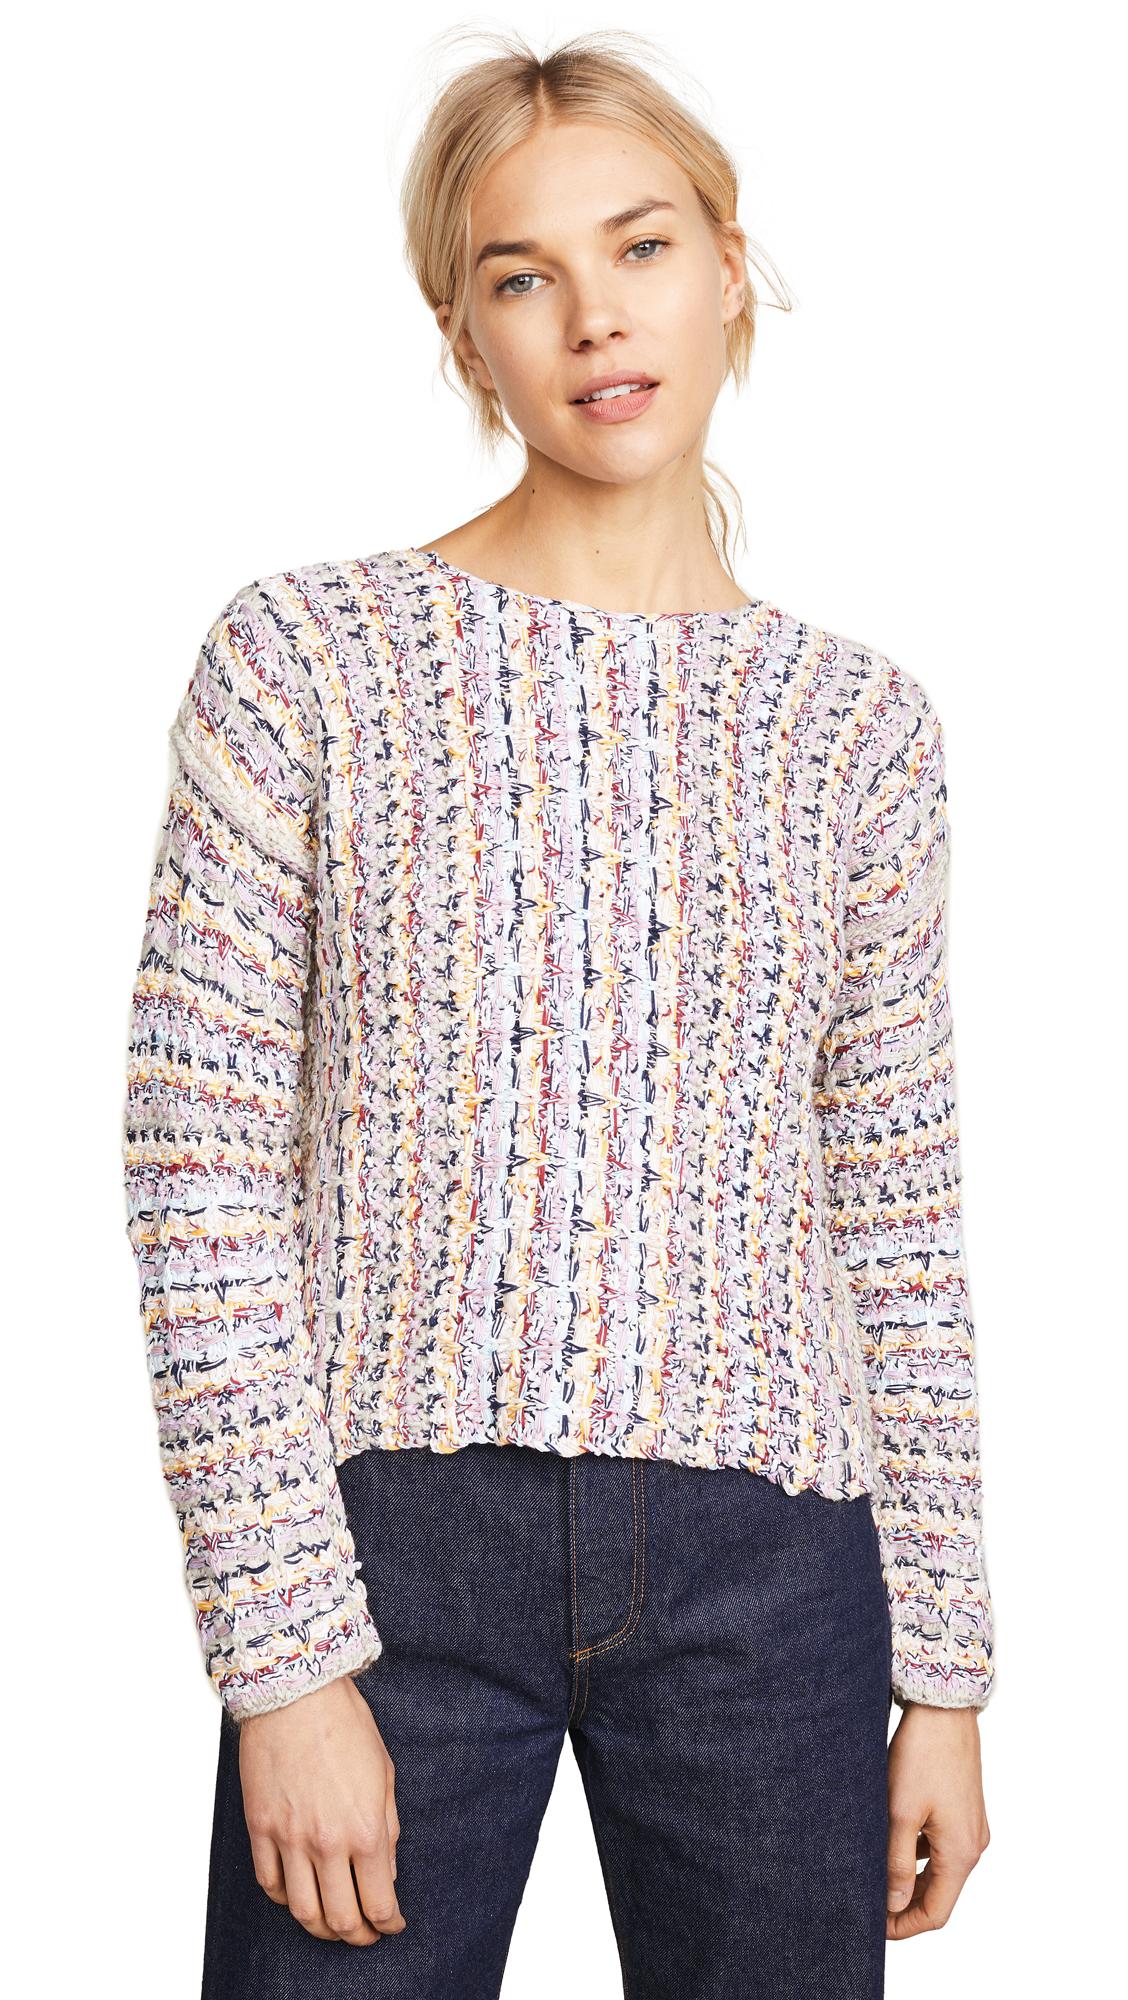 Adam Lippes Tweed Boat Neck Sweater - Ivory/Pink Multi